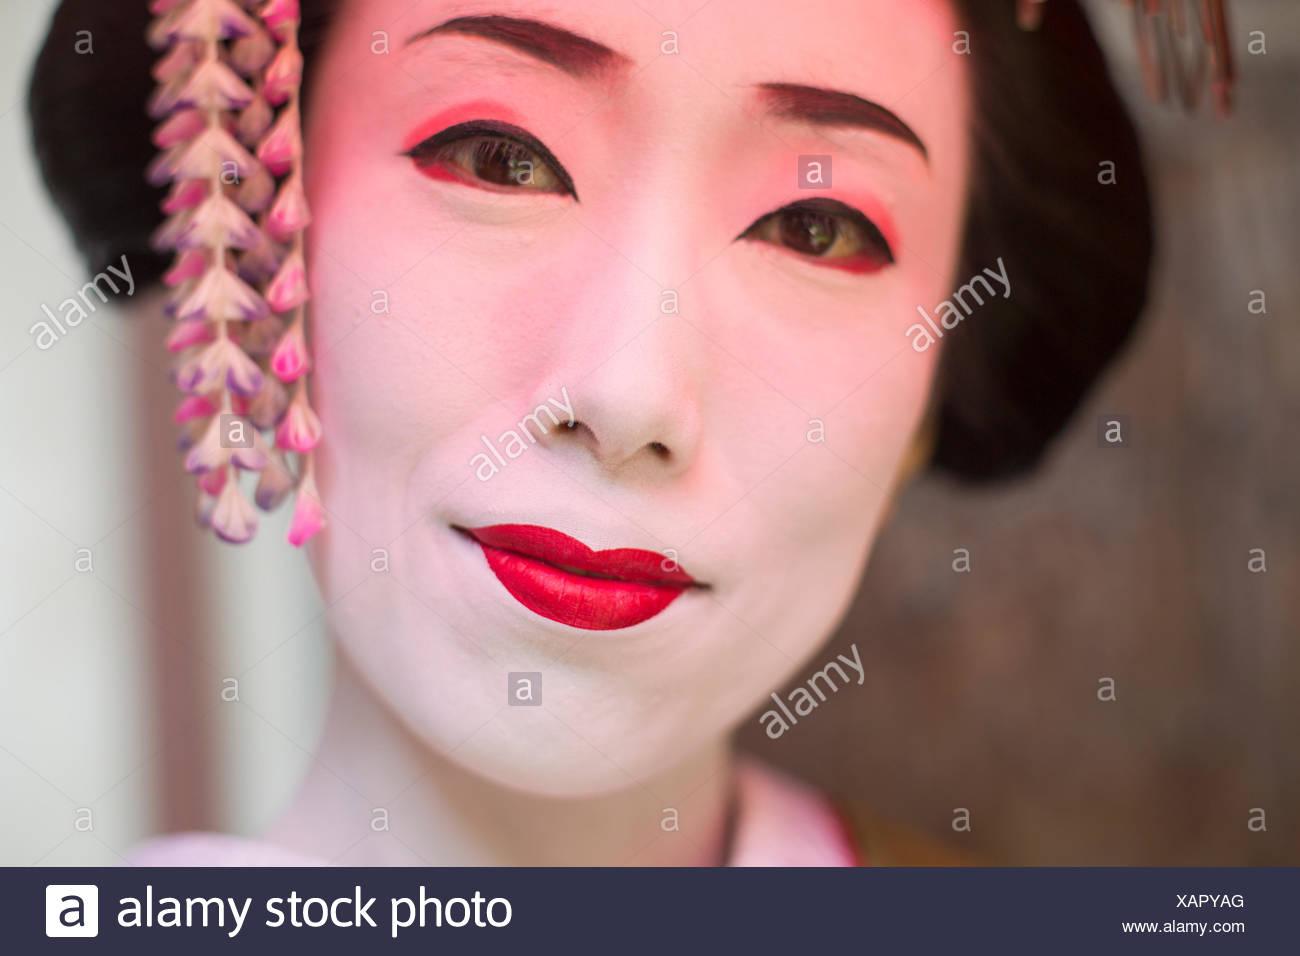 Elaborate Eye Make Up Imágenes De Stock & Elaborate Eye Make Up ...